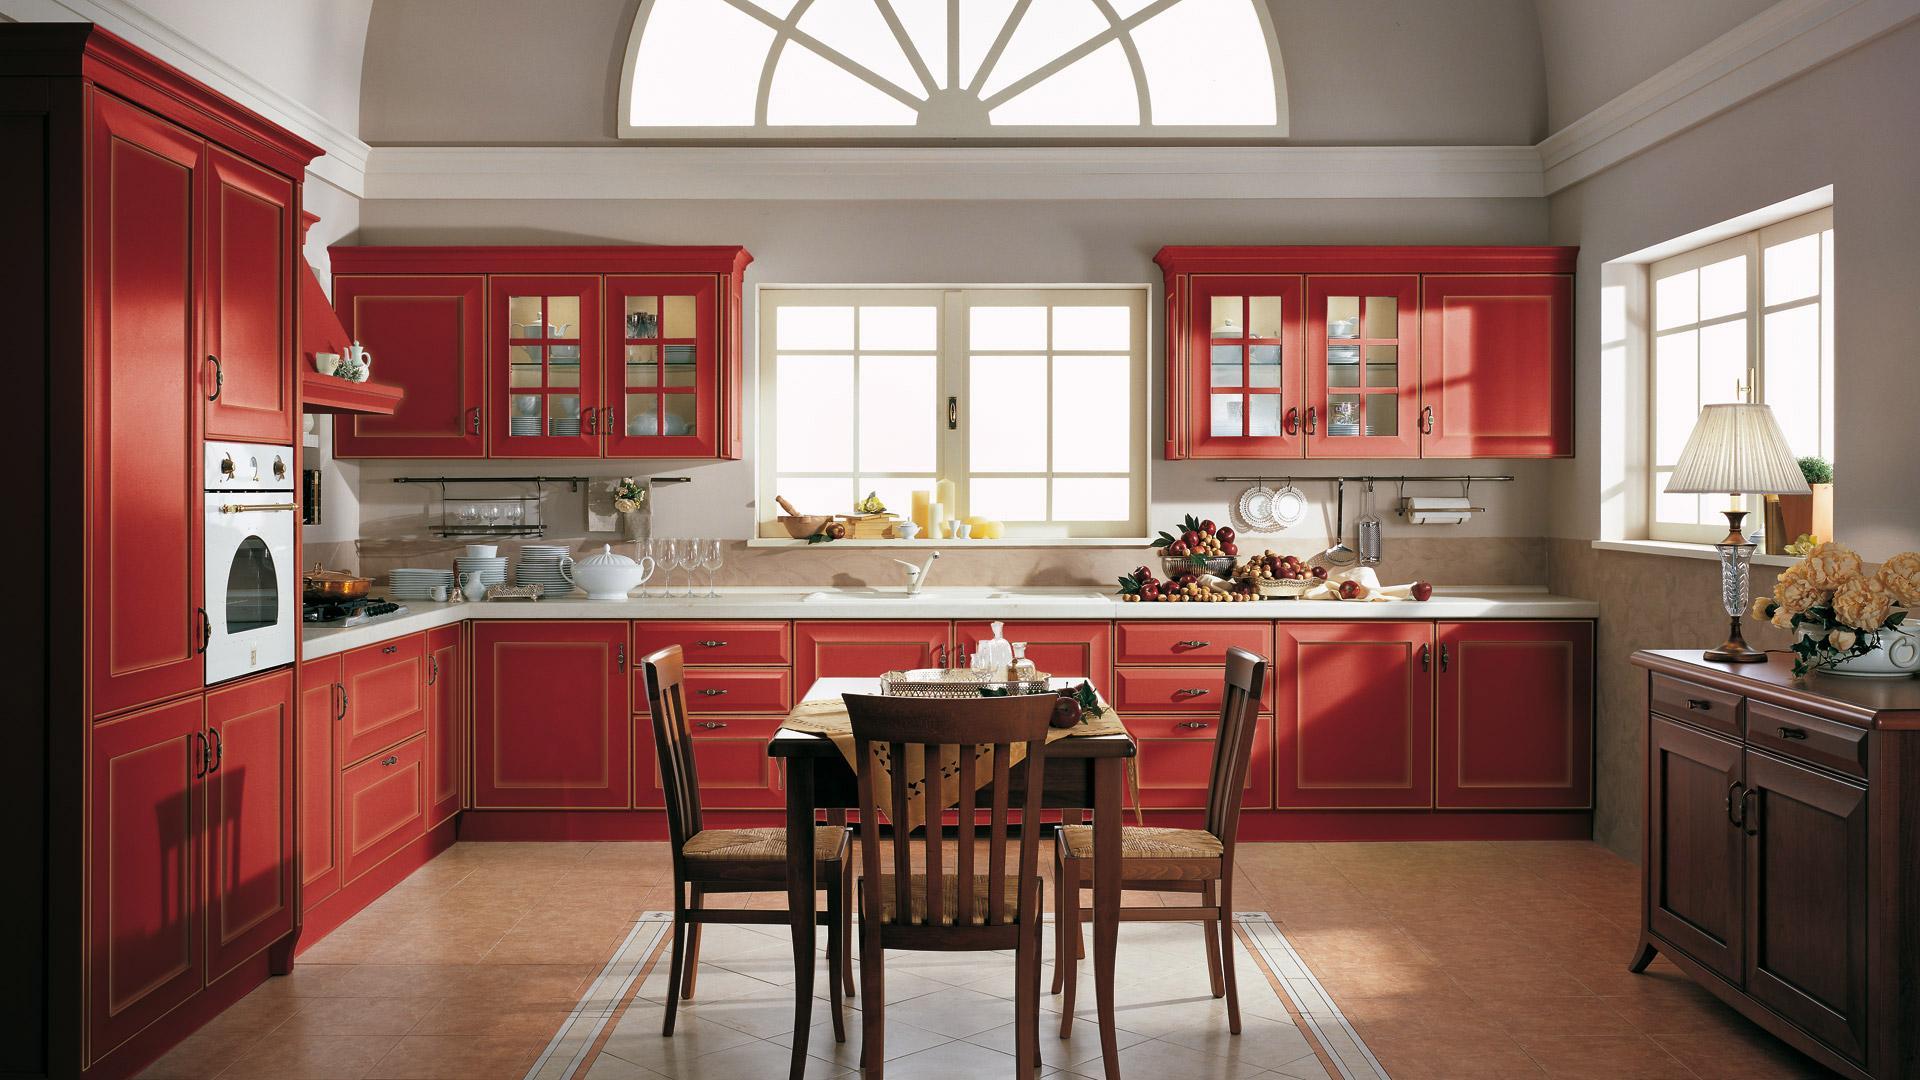 Cucina rustica le soluzioni classiche di lube store per for Casa rustica classica